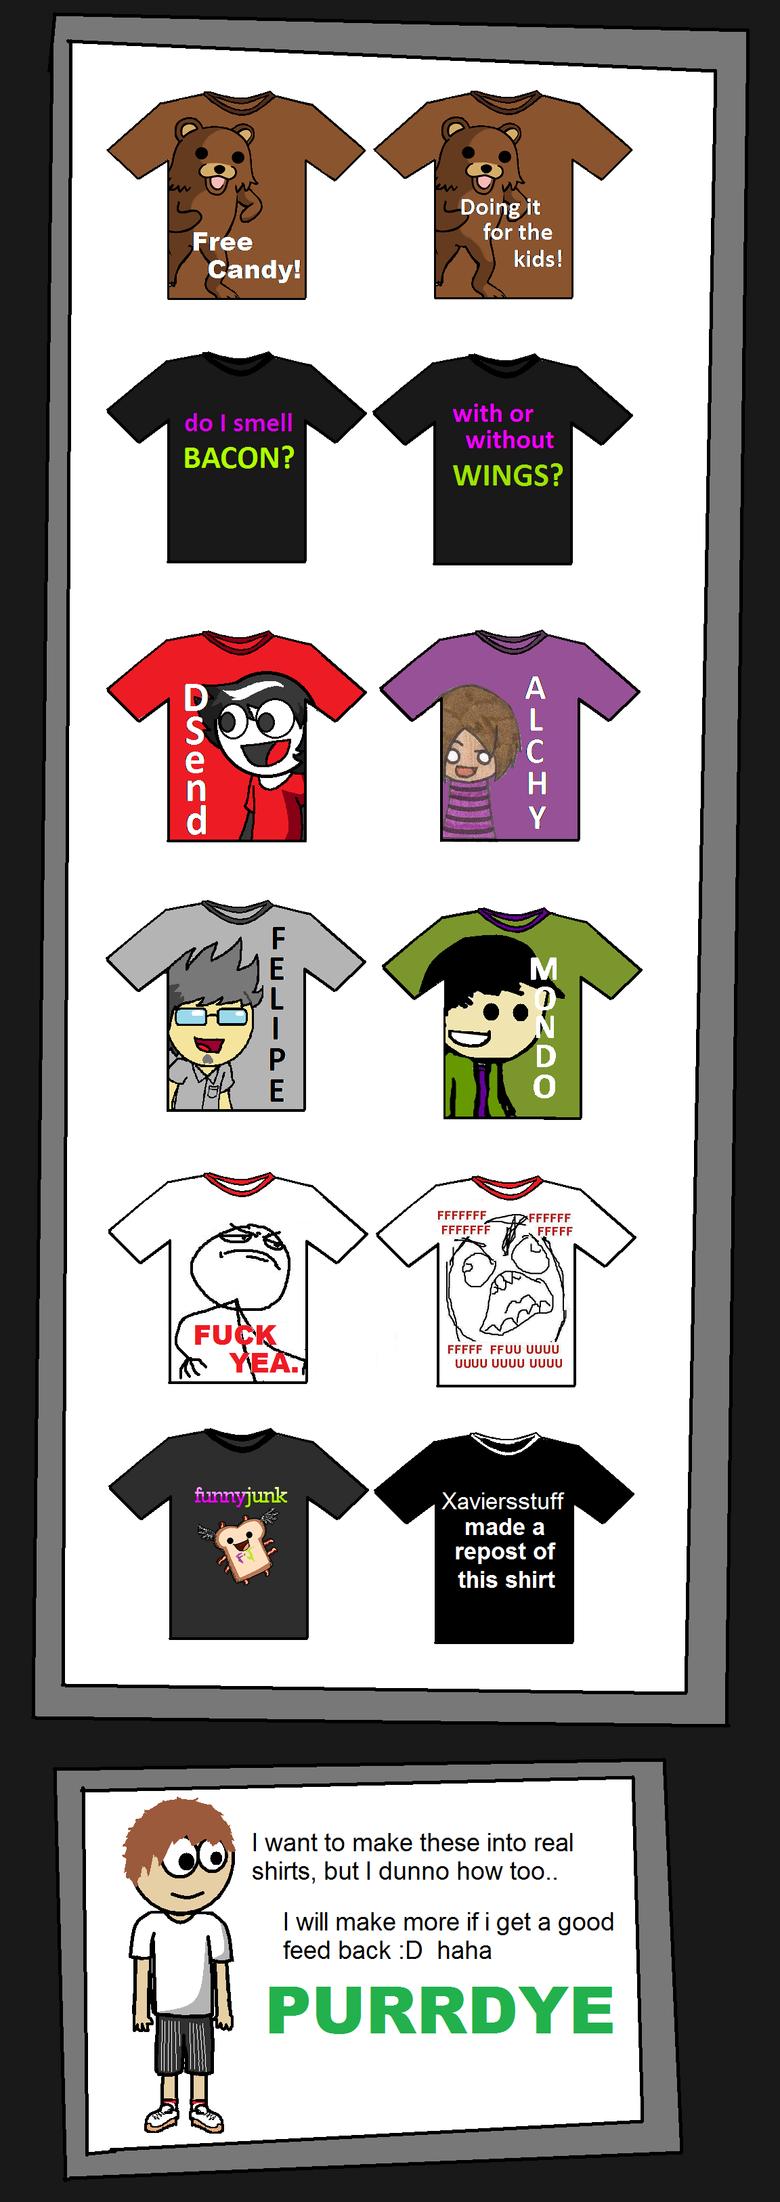 Shirt Designs. Part 2 /funny_pictures/448760/MOAR+Shirt+Des... anyone know a way to get these made in r/l?. FFUU uguu uguu uguu Xaviersstuff made a repost of th shirts designs Bacon is orgasmic